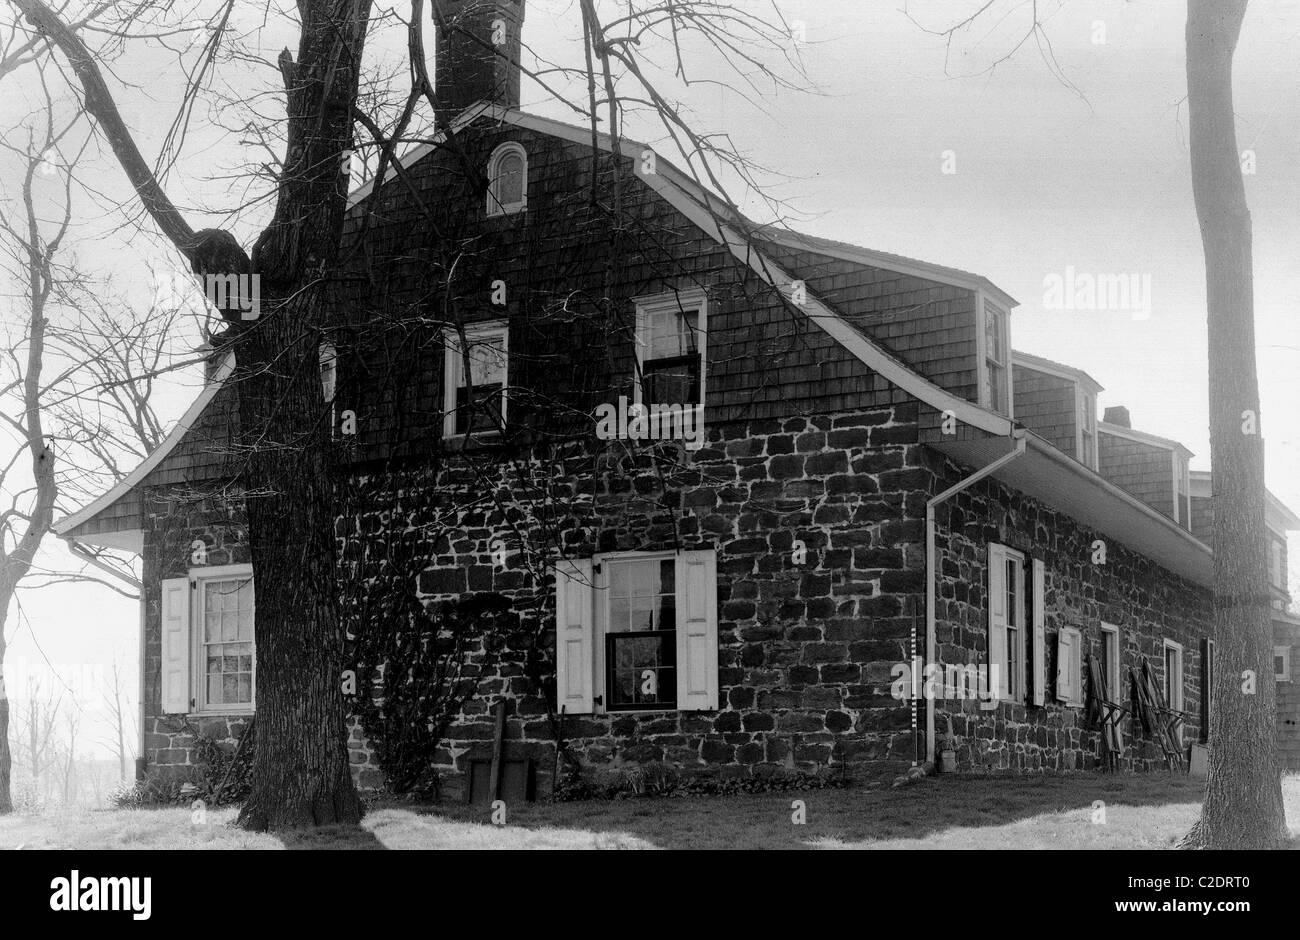 Ackerman house, Hackensack, New Jersey - Stock Image